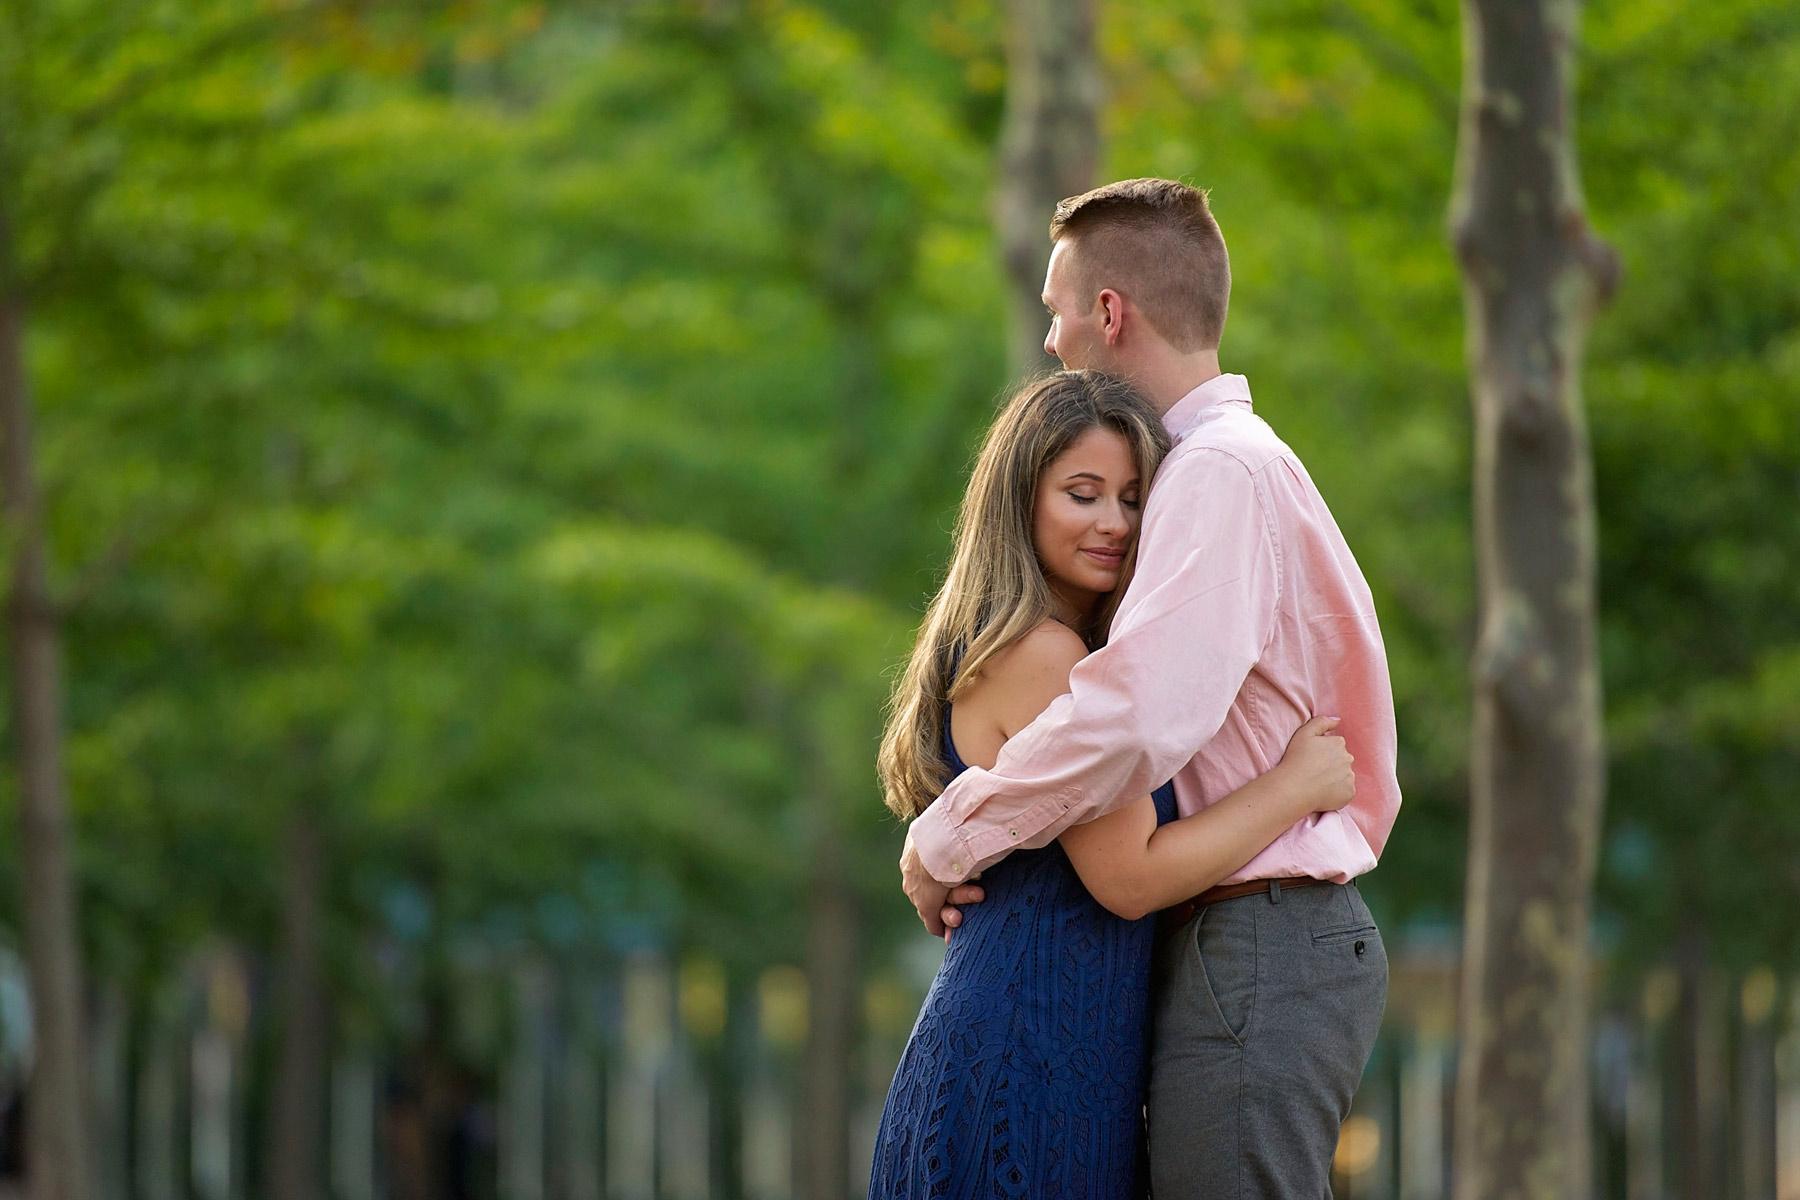 Hoboken_engagement_photographer_bride_and_groom_embrace.JPG